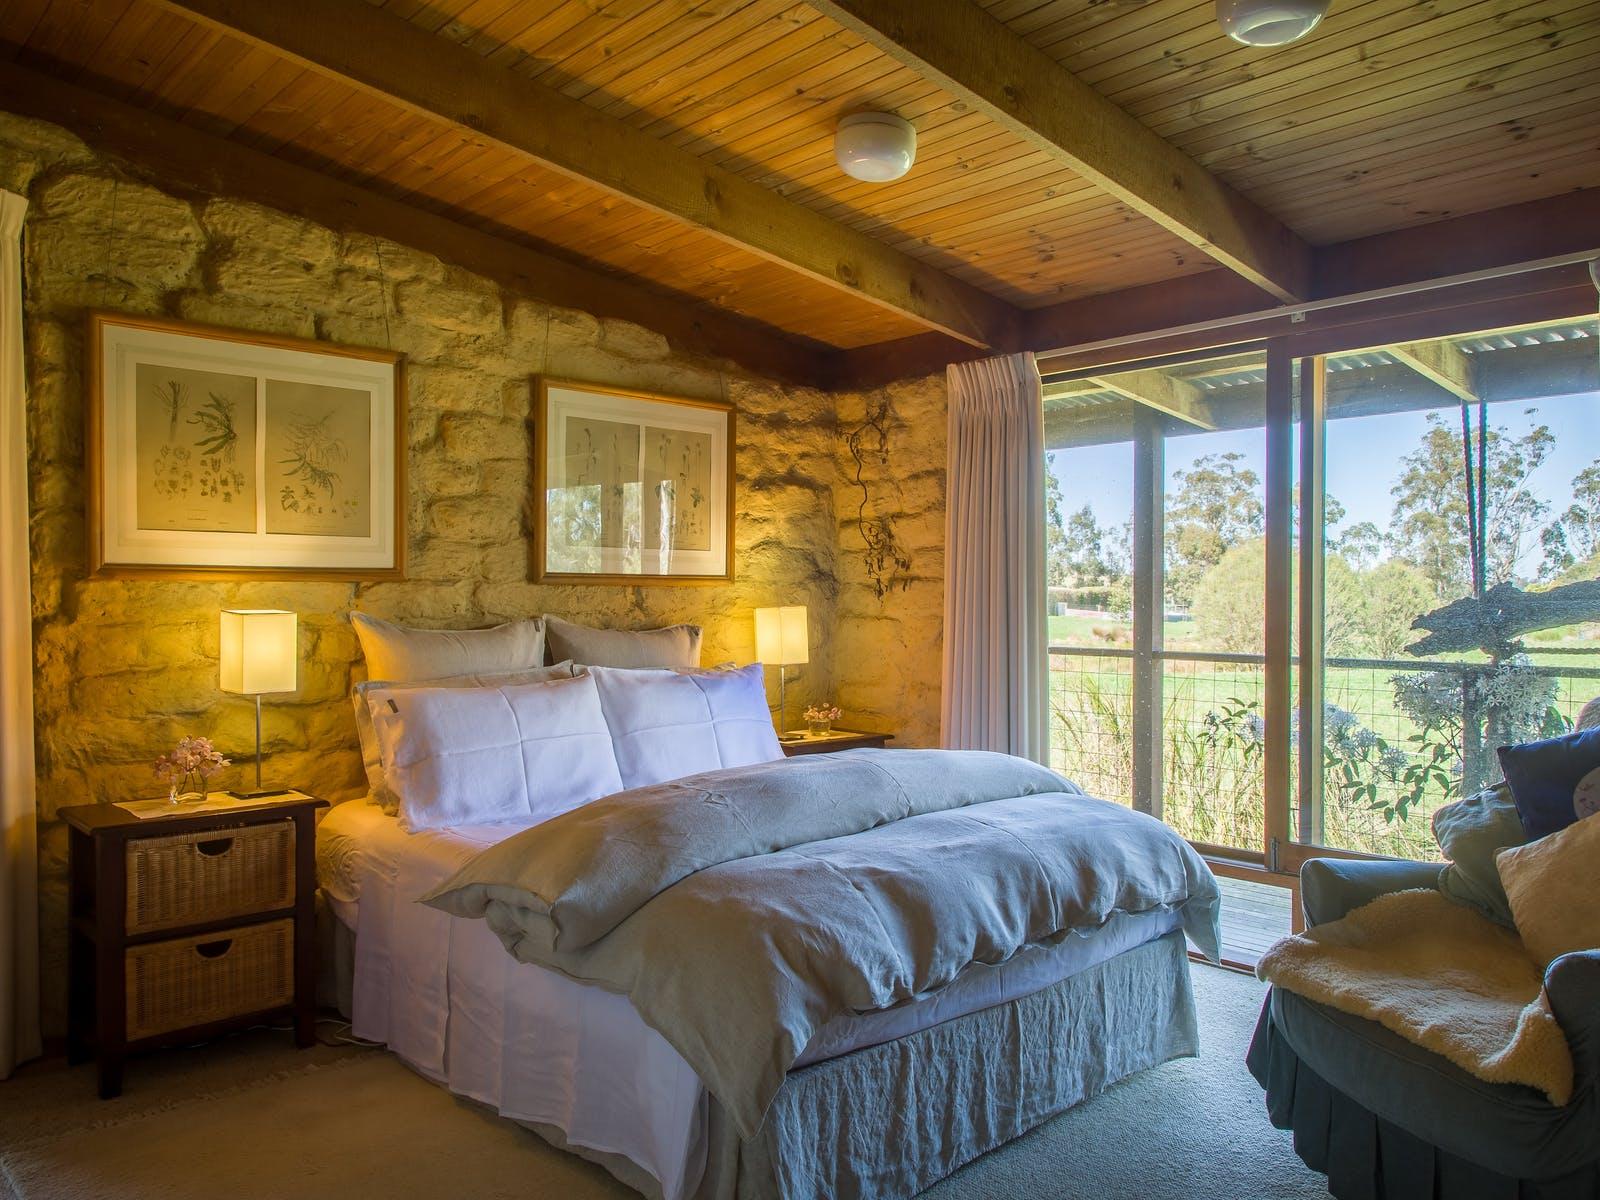 Cosy, comfy and quiet bedroom